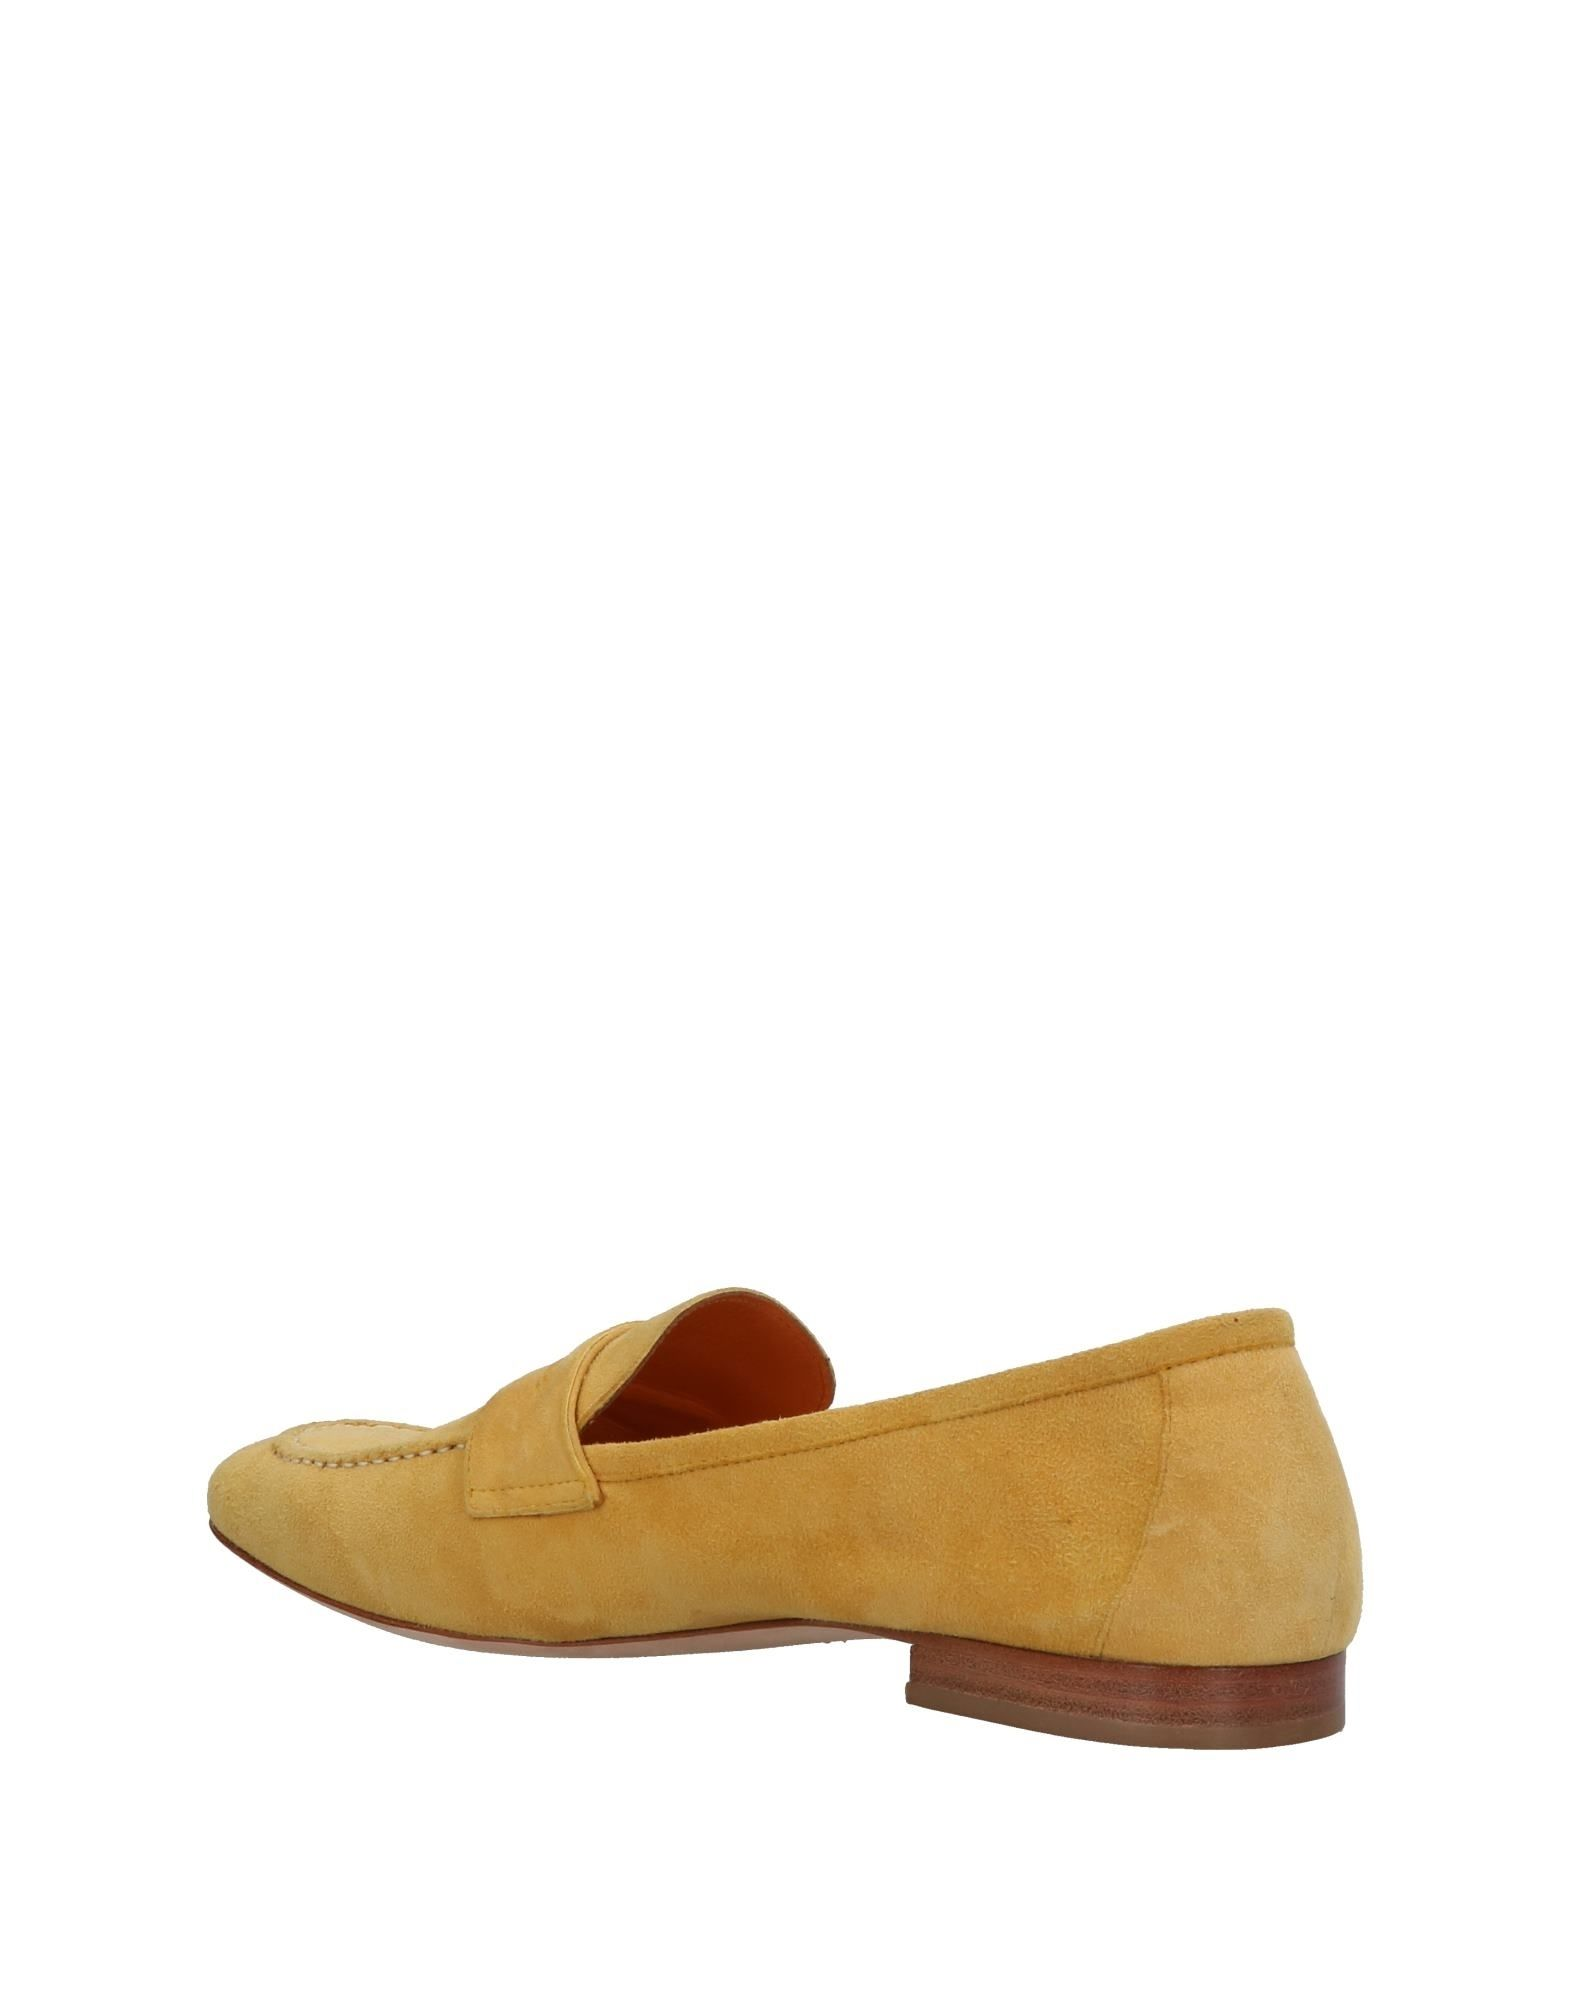 La Corte Della Pelle By Franco Ballin Mokassins Damen  11375195XC Gute Qualität beliebte Schuhe